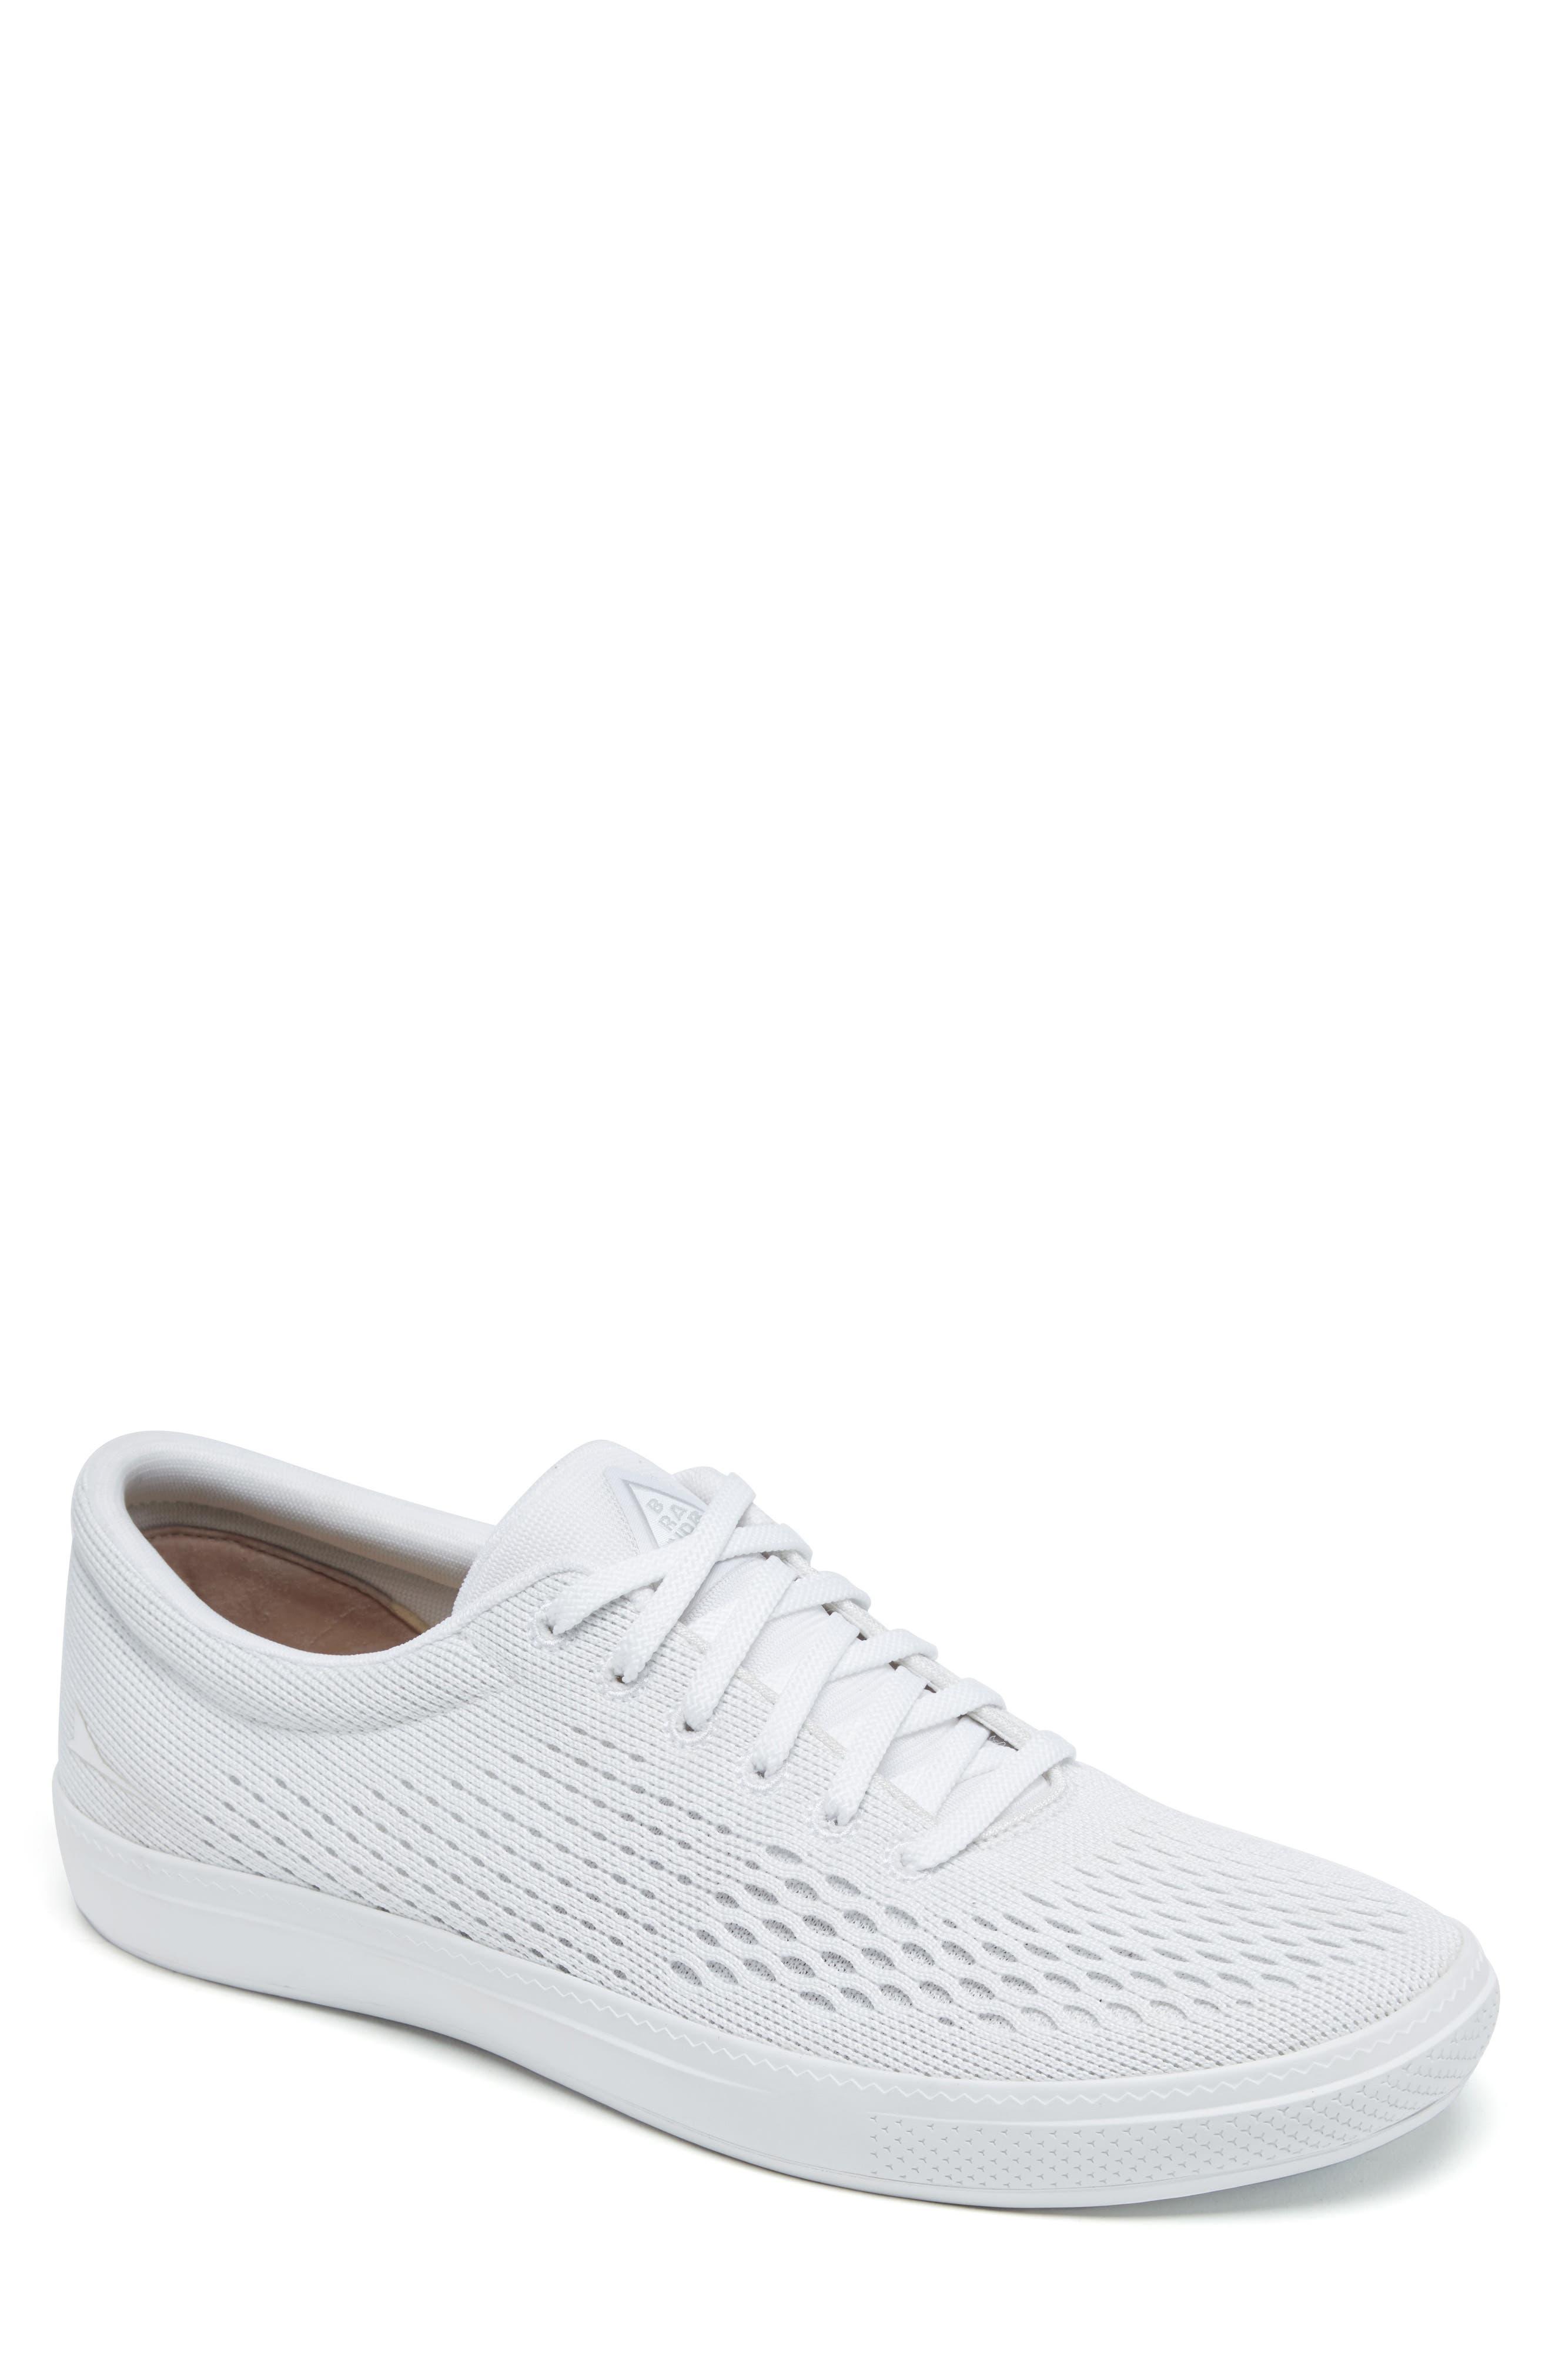 August II Sneaker,                             Main thumbnail 1, color,                             WHITE